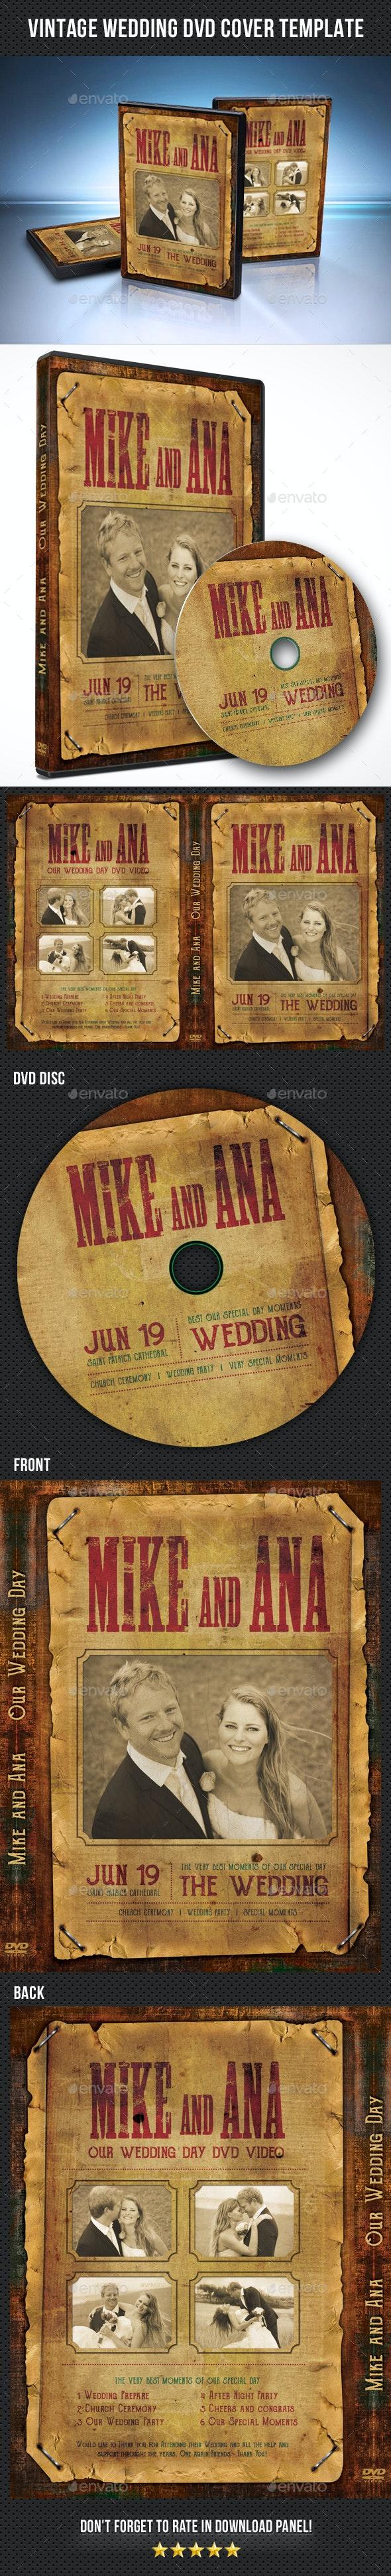 Vintage Wedding DVD Cover Template - CD & DVD Artwork Print Templates